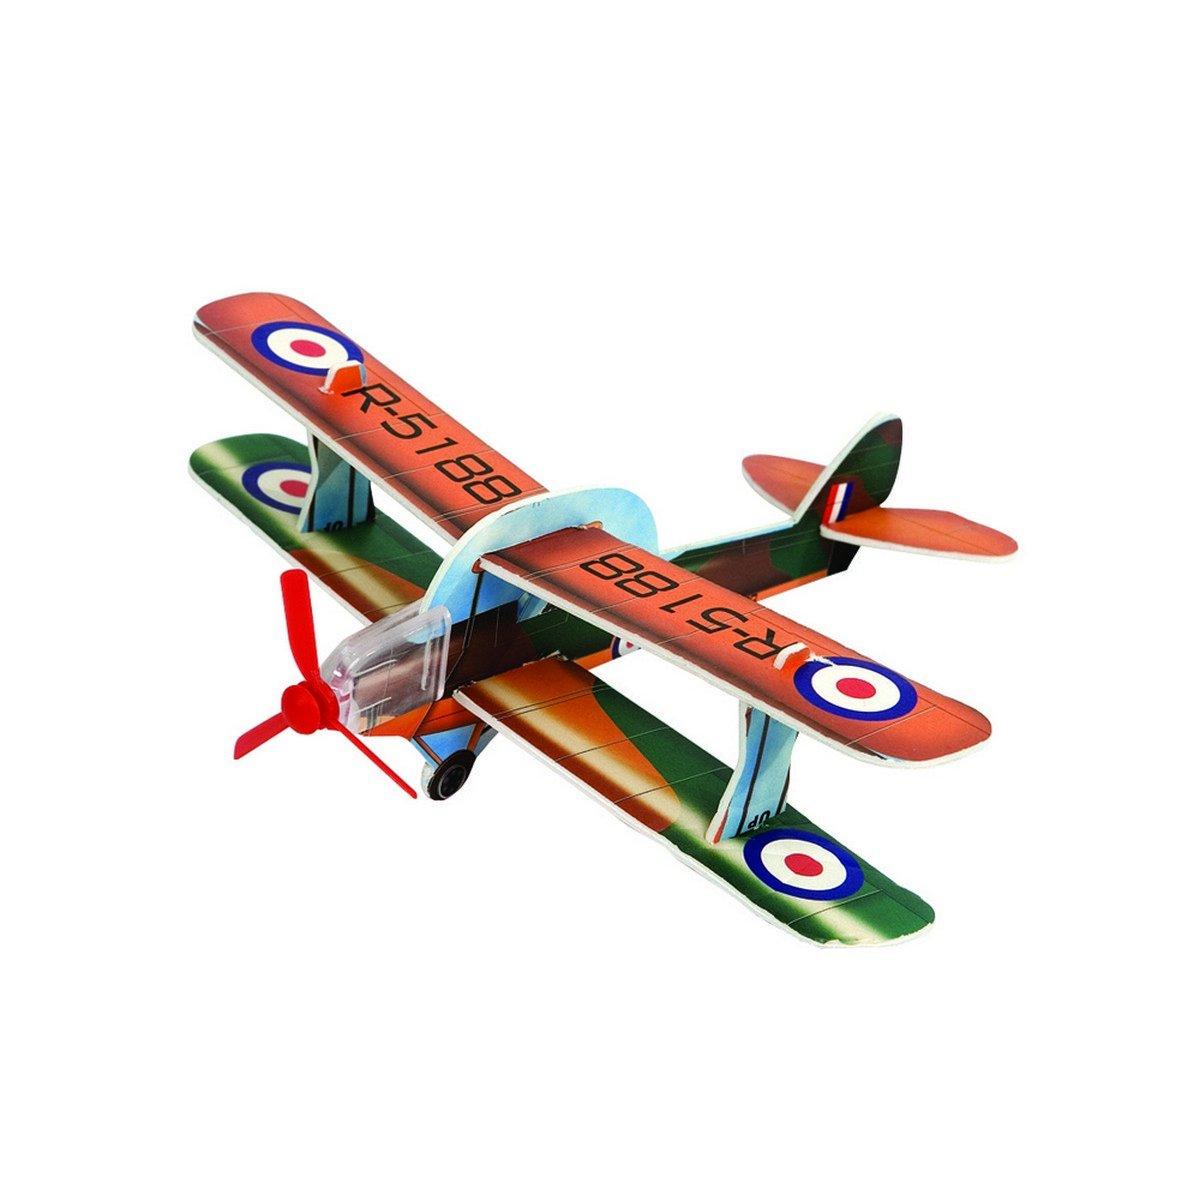 Abbildung von Agradi Flugzeug aus Tempex Mehrfarbig 24x7cm